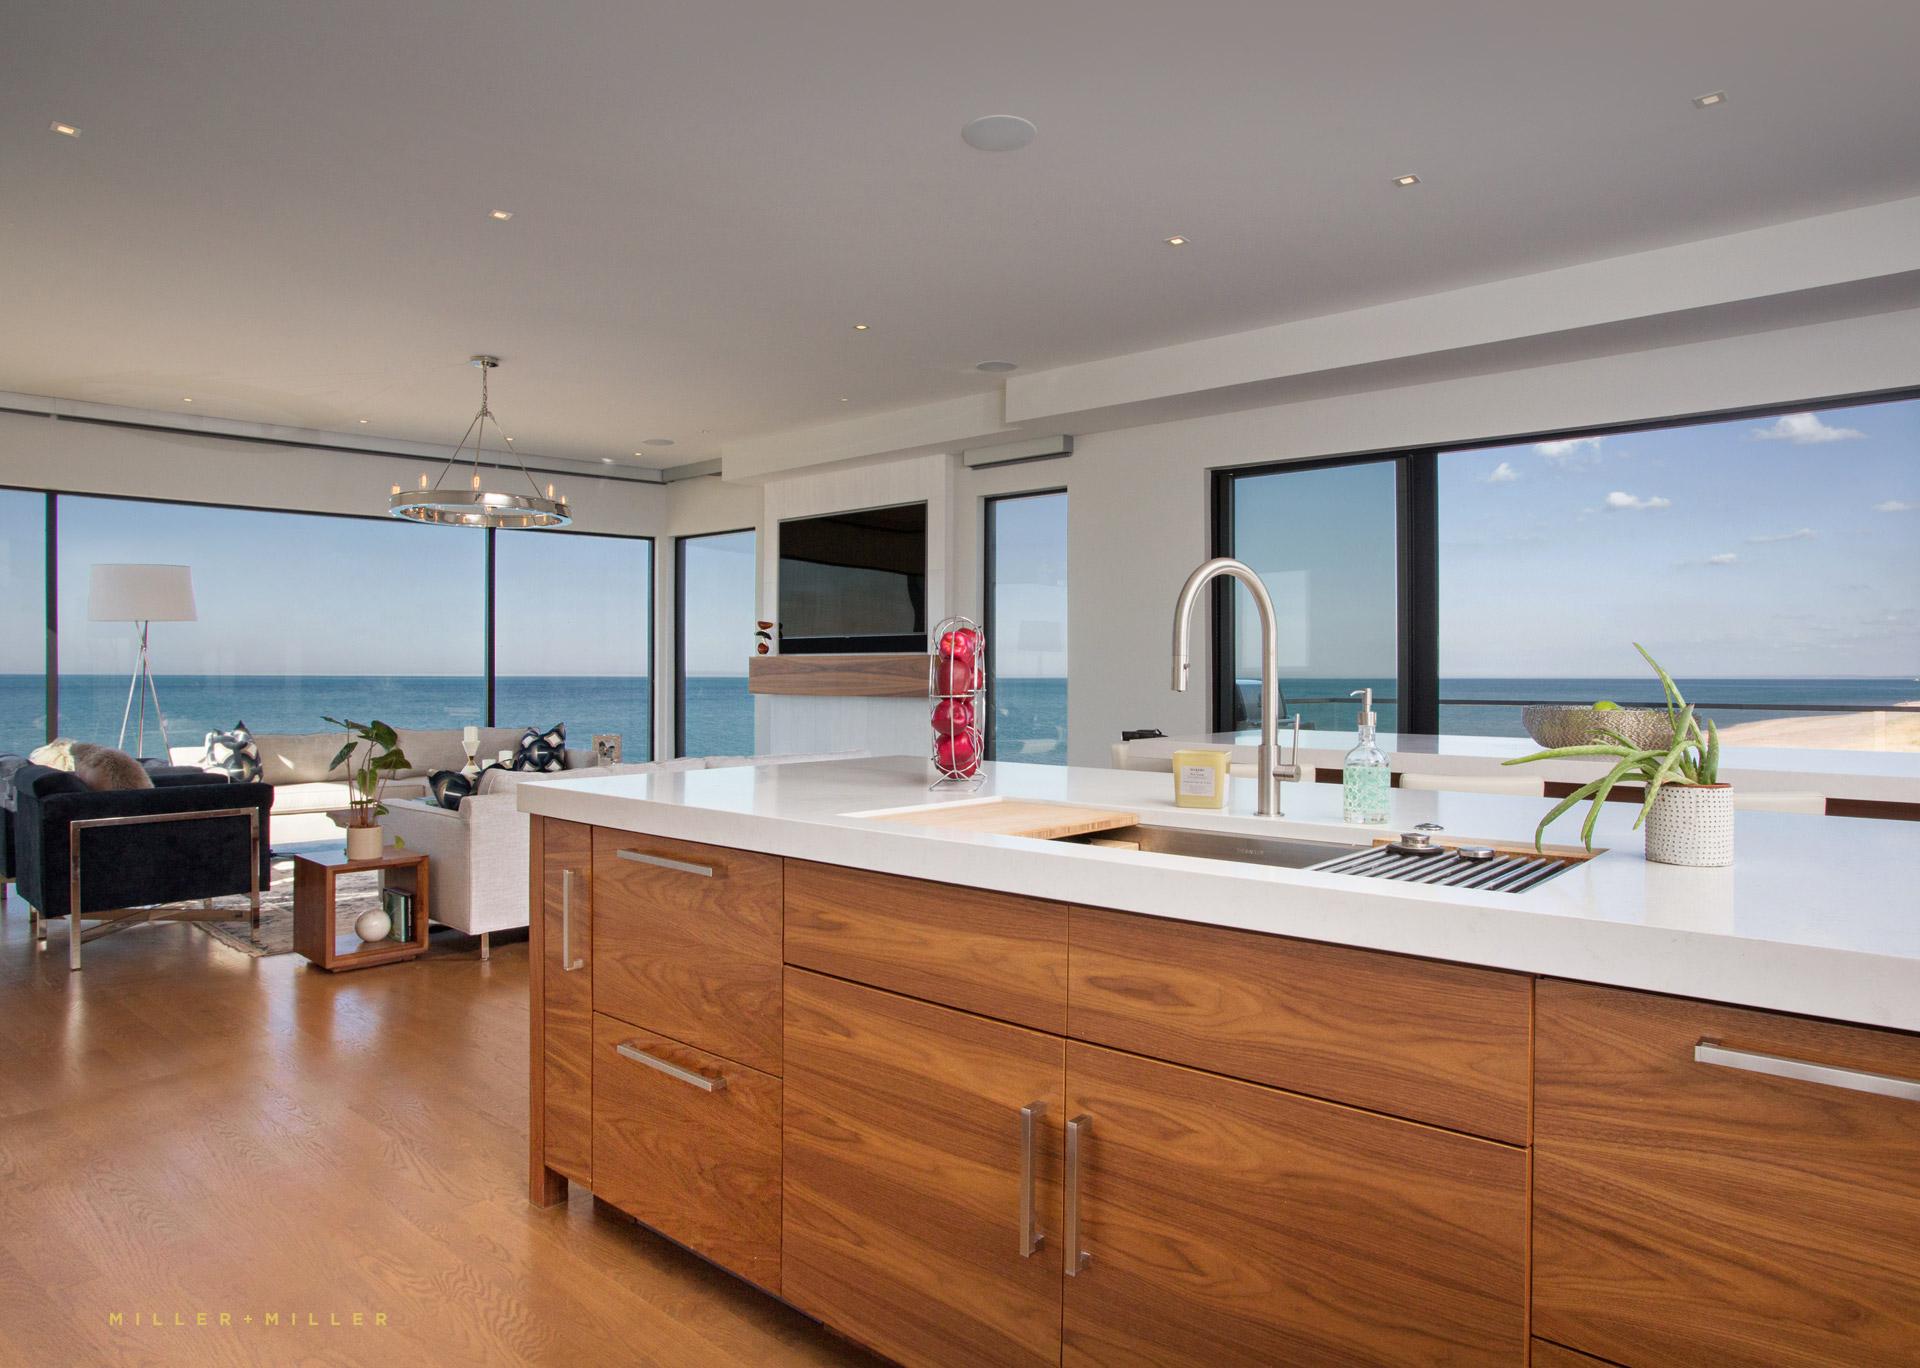 Modern Lake Home Kitchen Photography